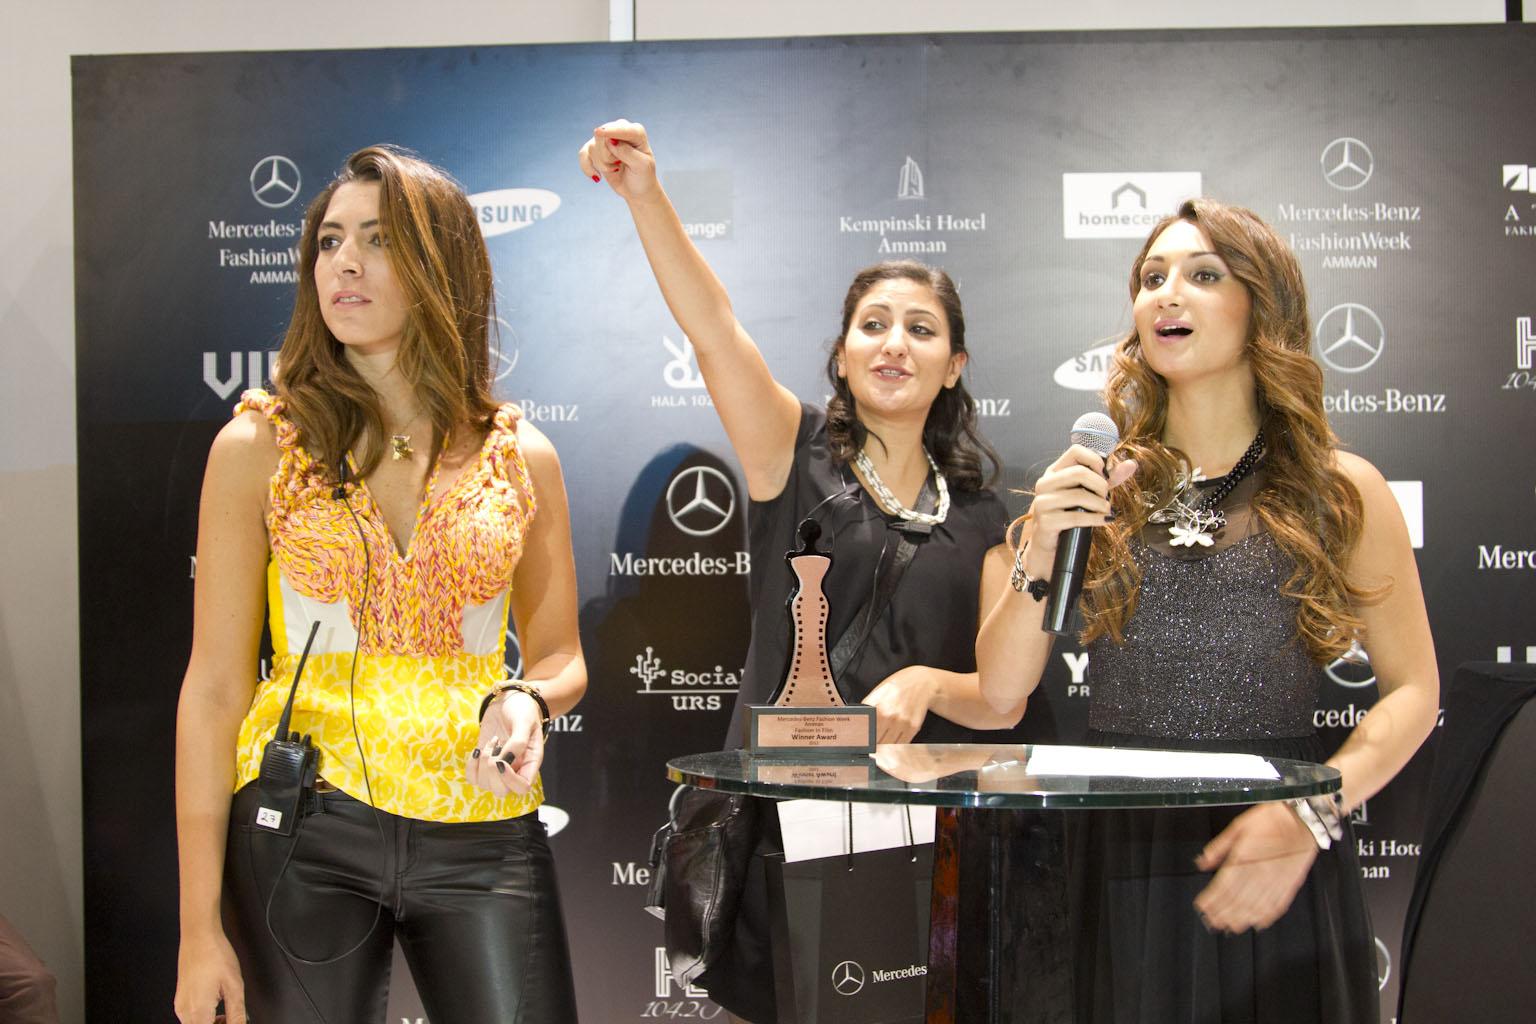 Organizors staff mercedes benz fashion week amman jordan for Mercedes benz of chandler staff